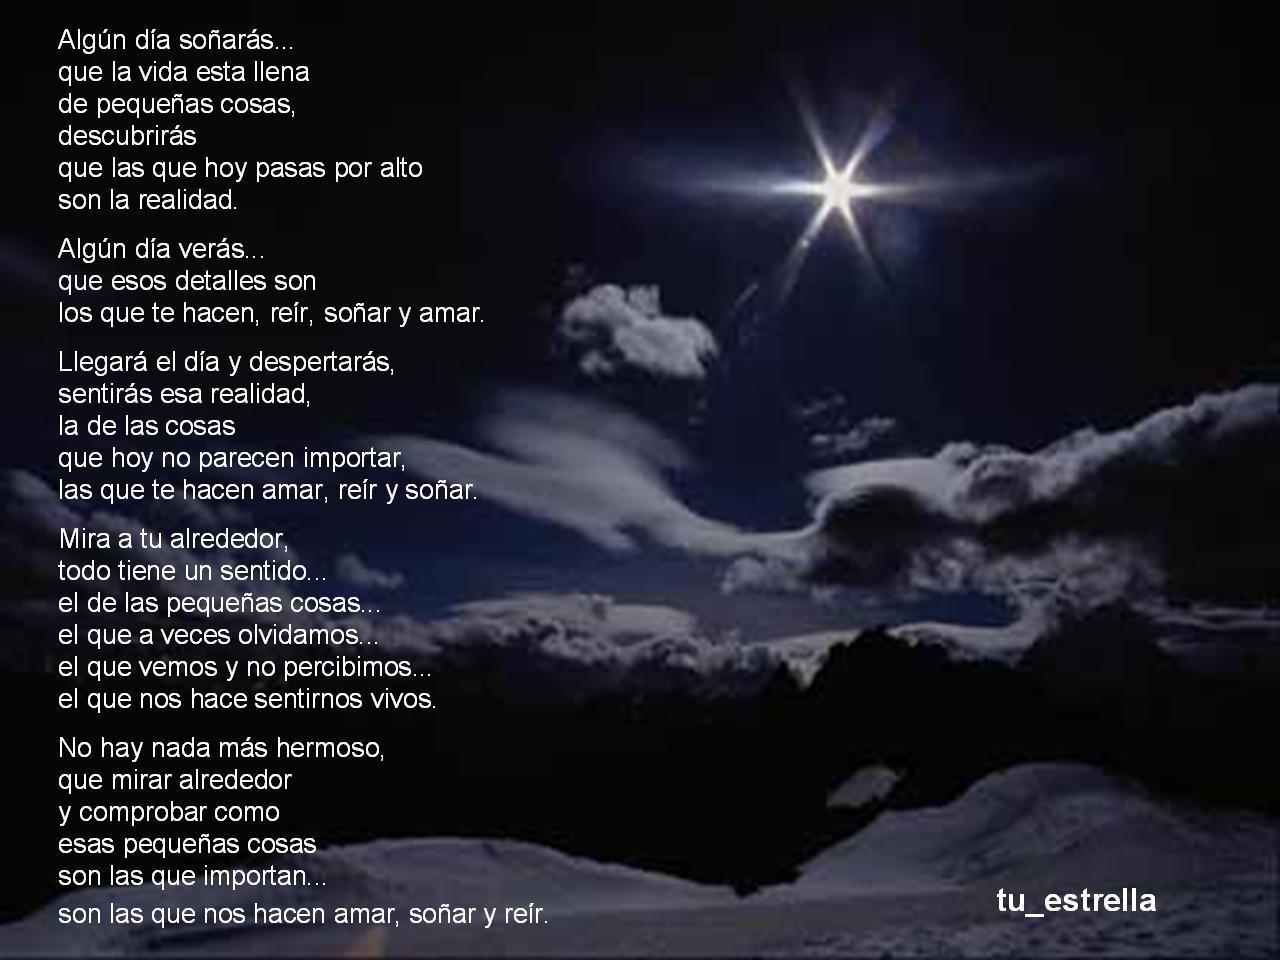 estrella frases de amor pequeno poemas de amor poesia categorias mar